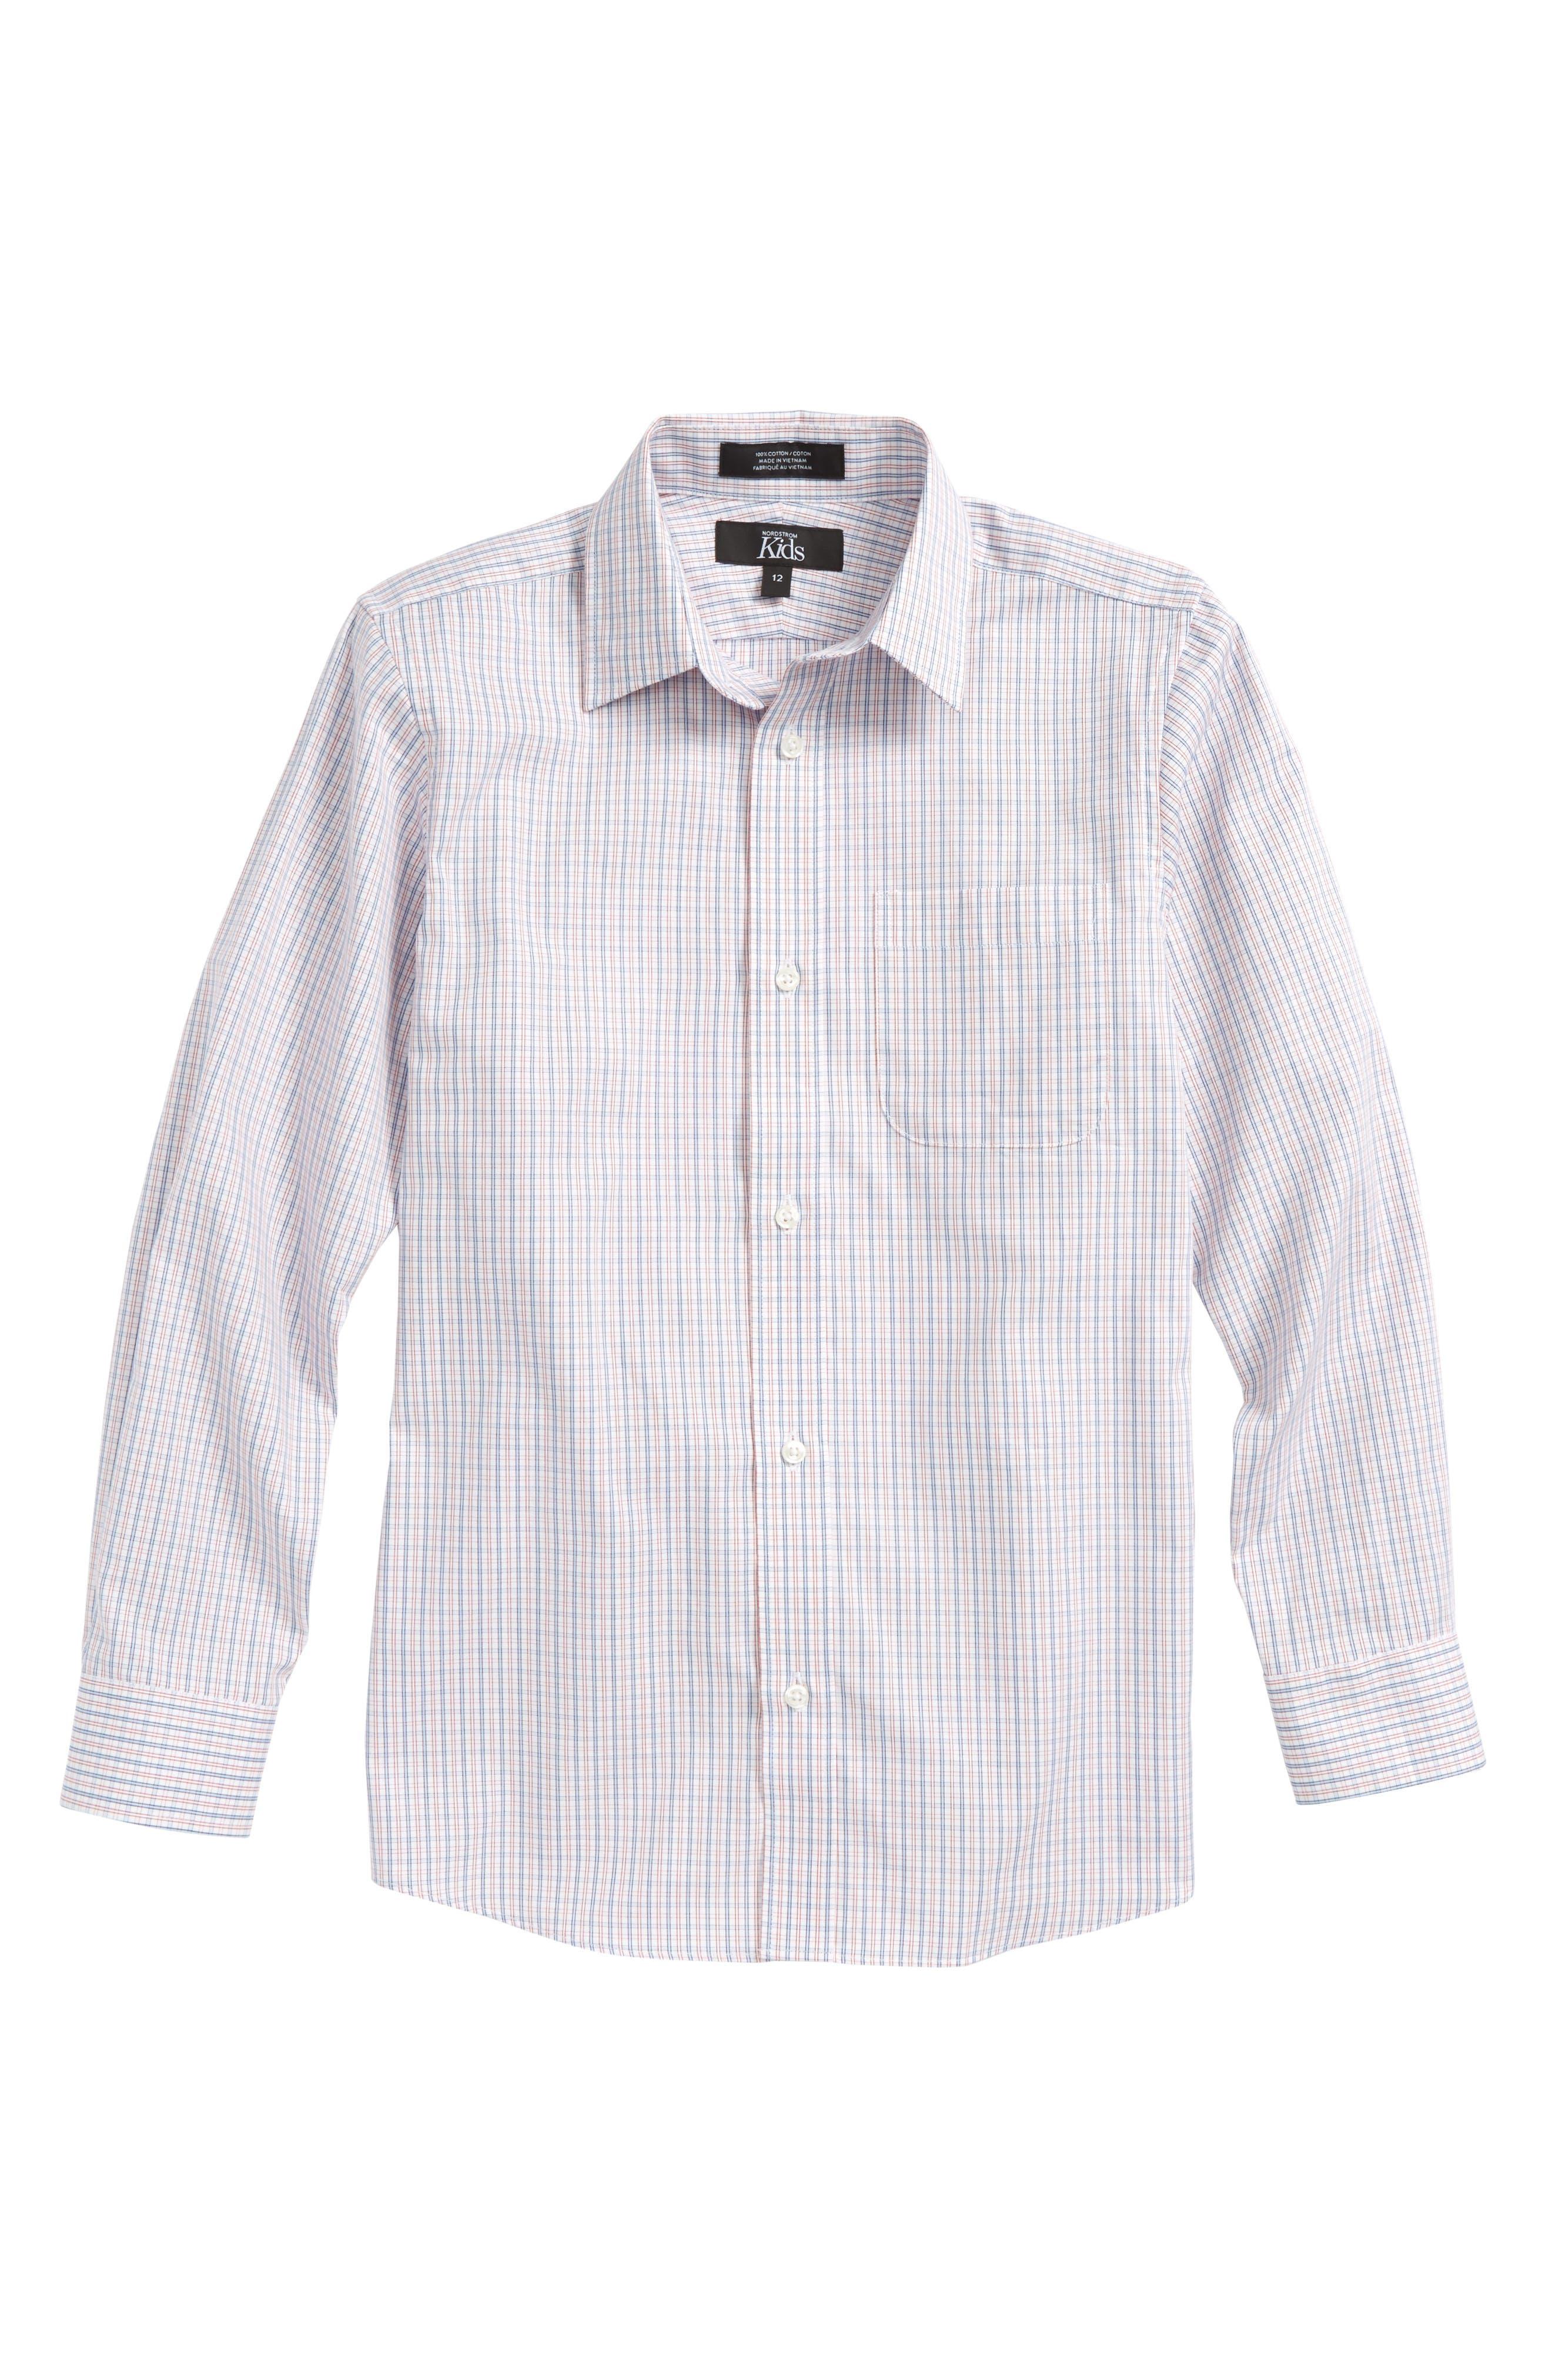 Plaid Dress Shirt,                             Main thumbnail 1, color,                             White- Blue Plaid